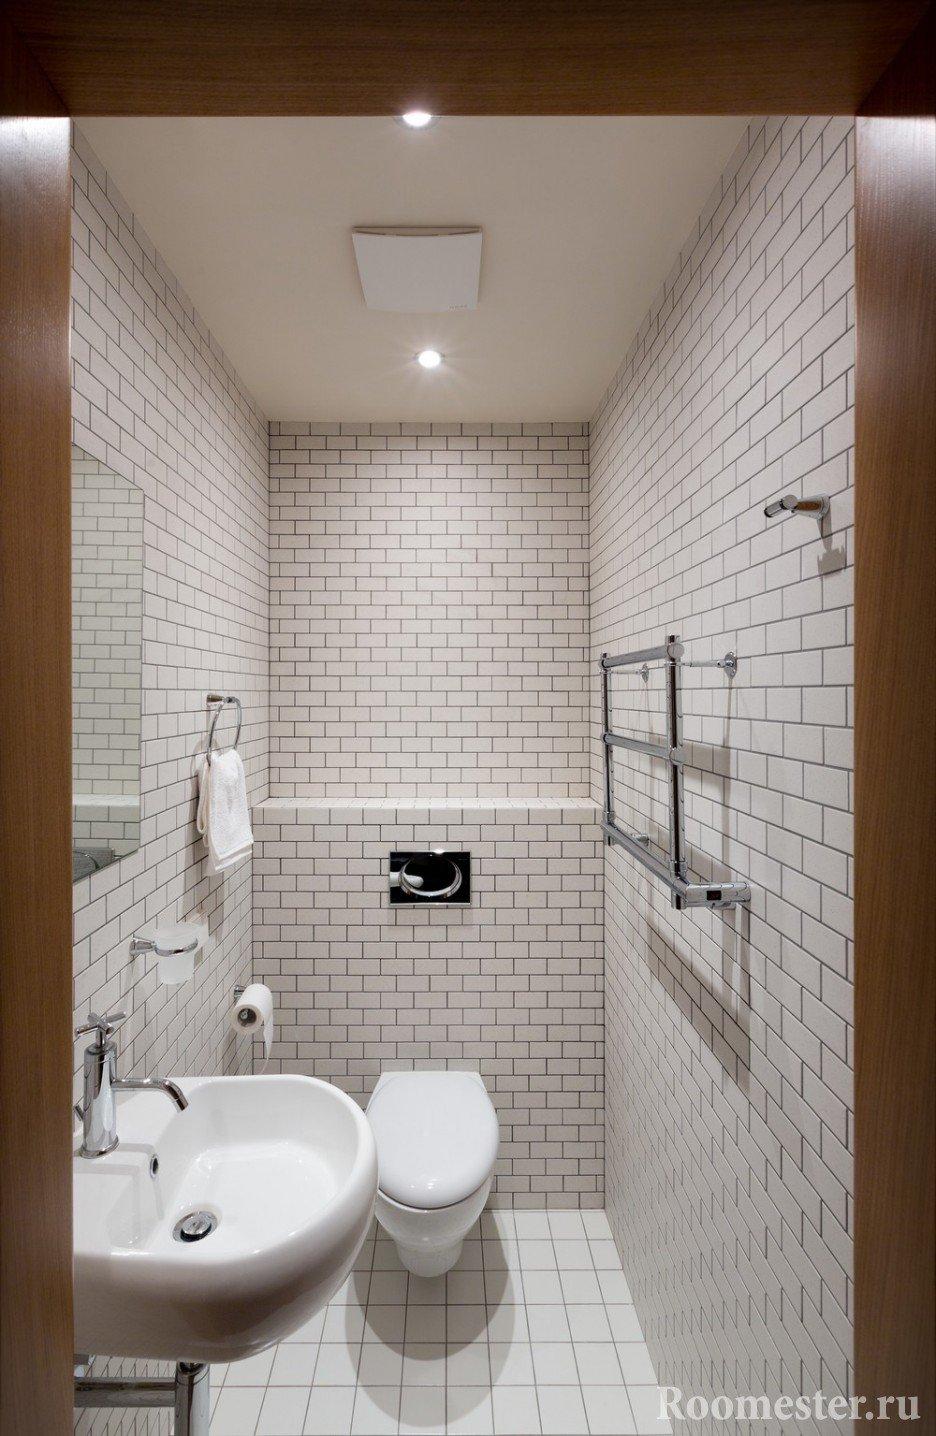 https://roomester.ru/wp-content/uploads/2017/03/dizajn-tualeta-10.jpg